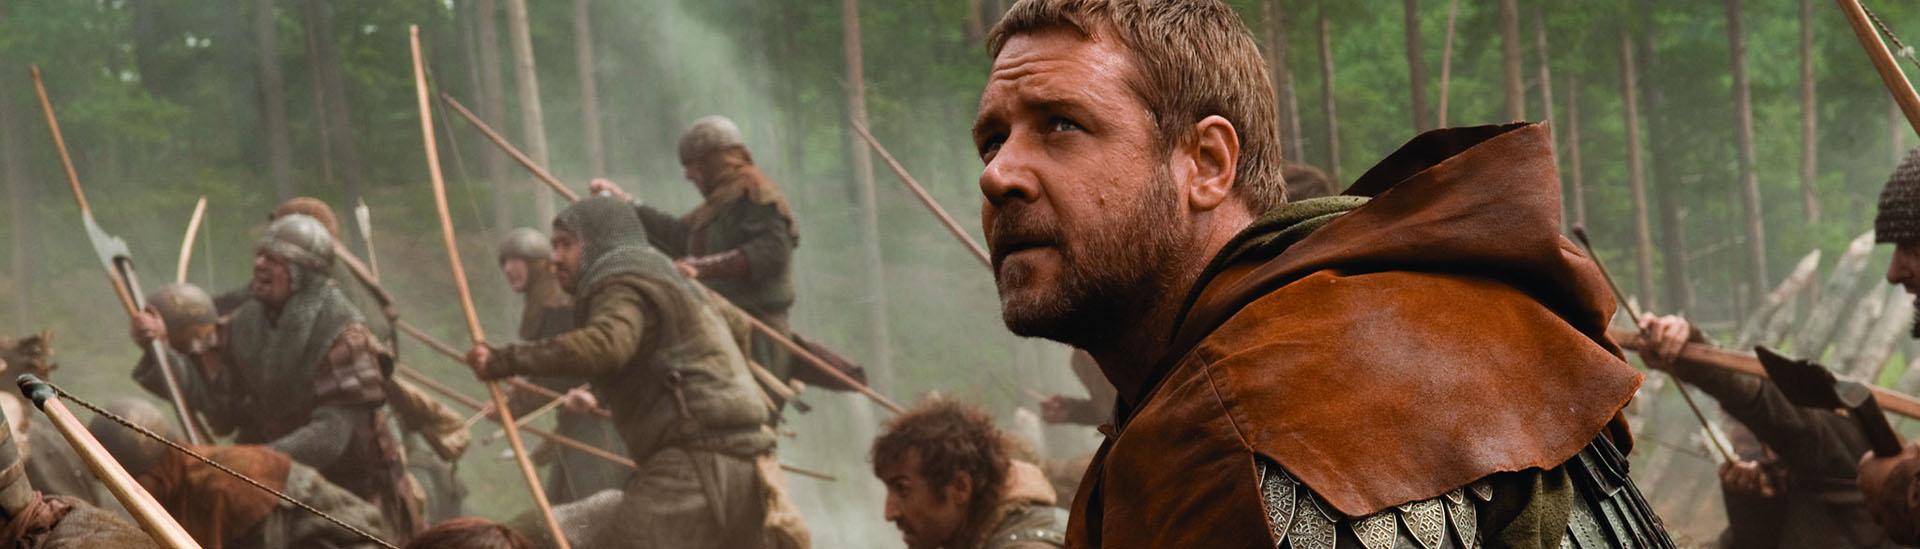 Baner filmu 'Robin Hood'